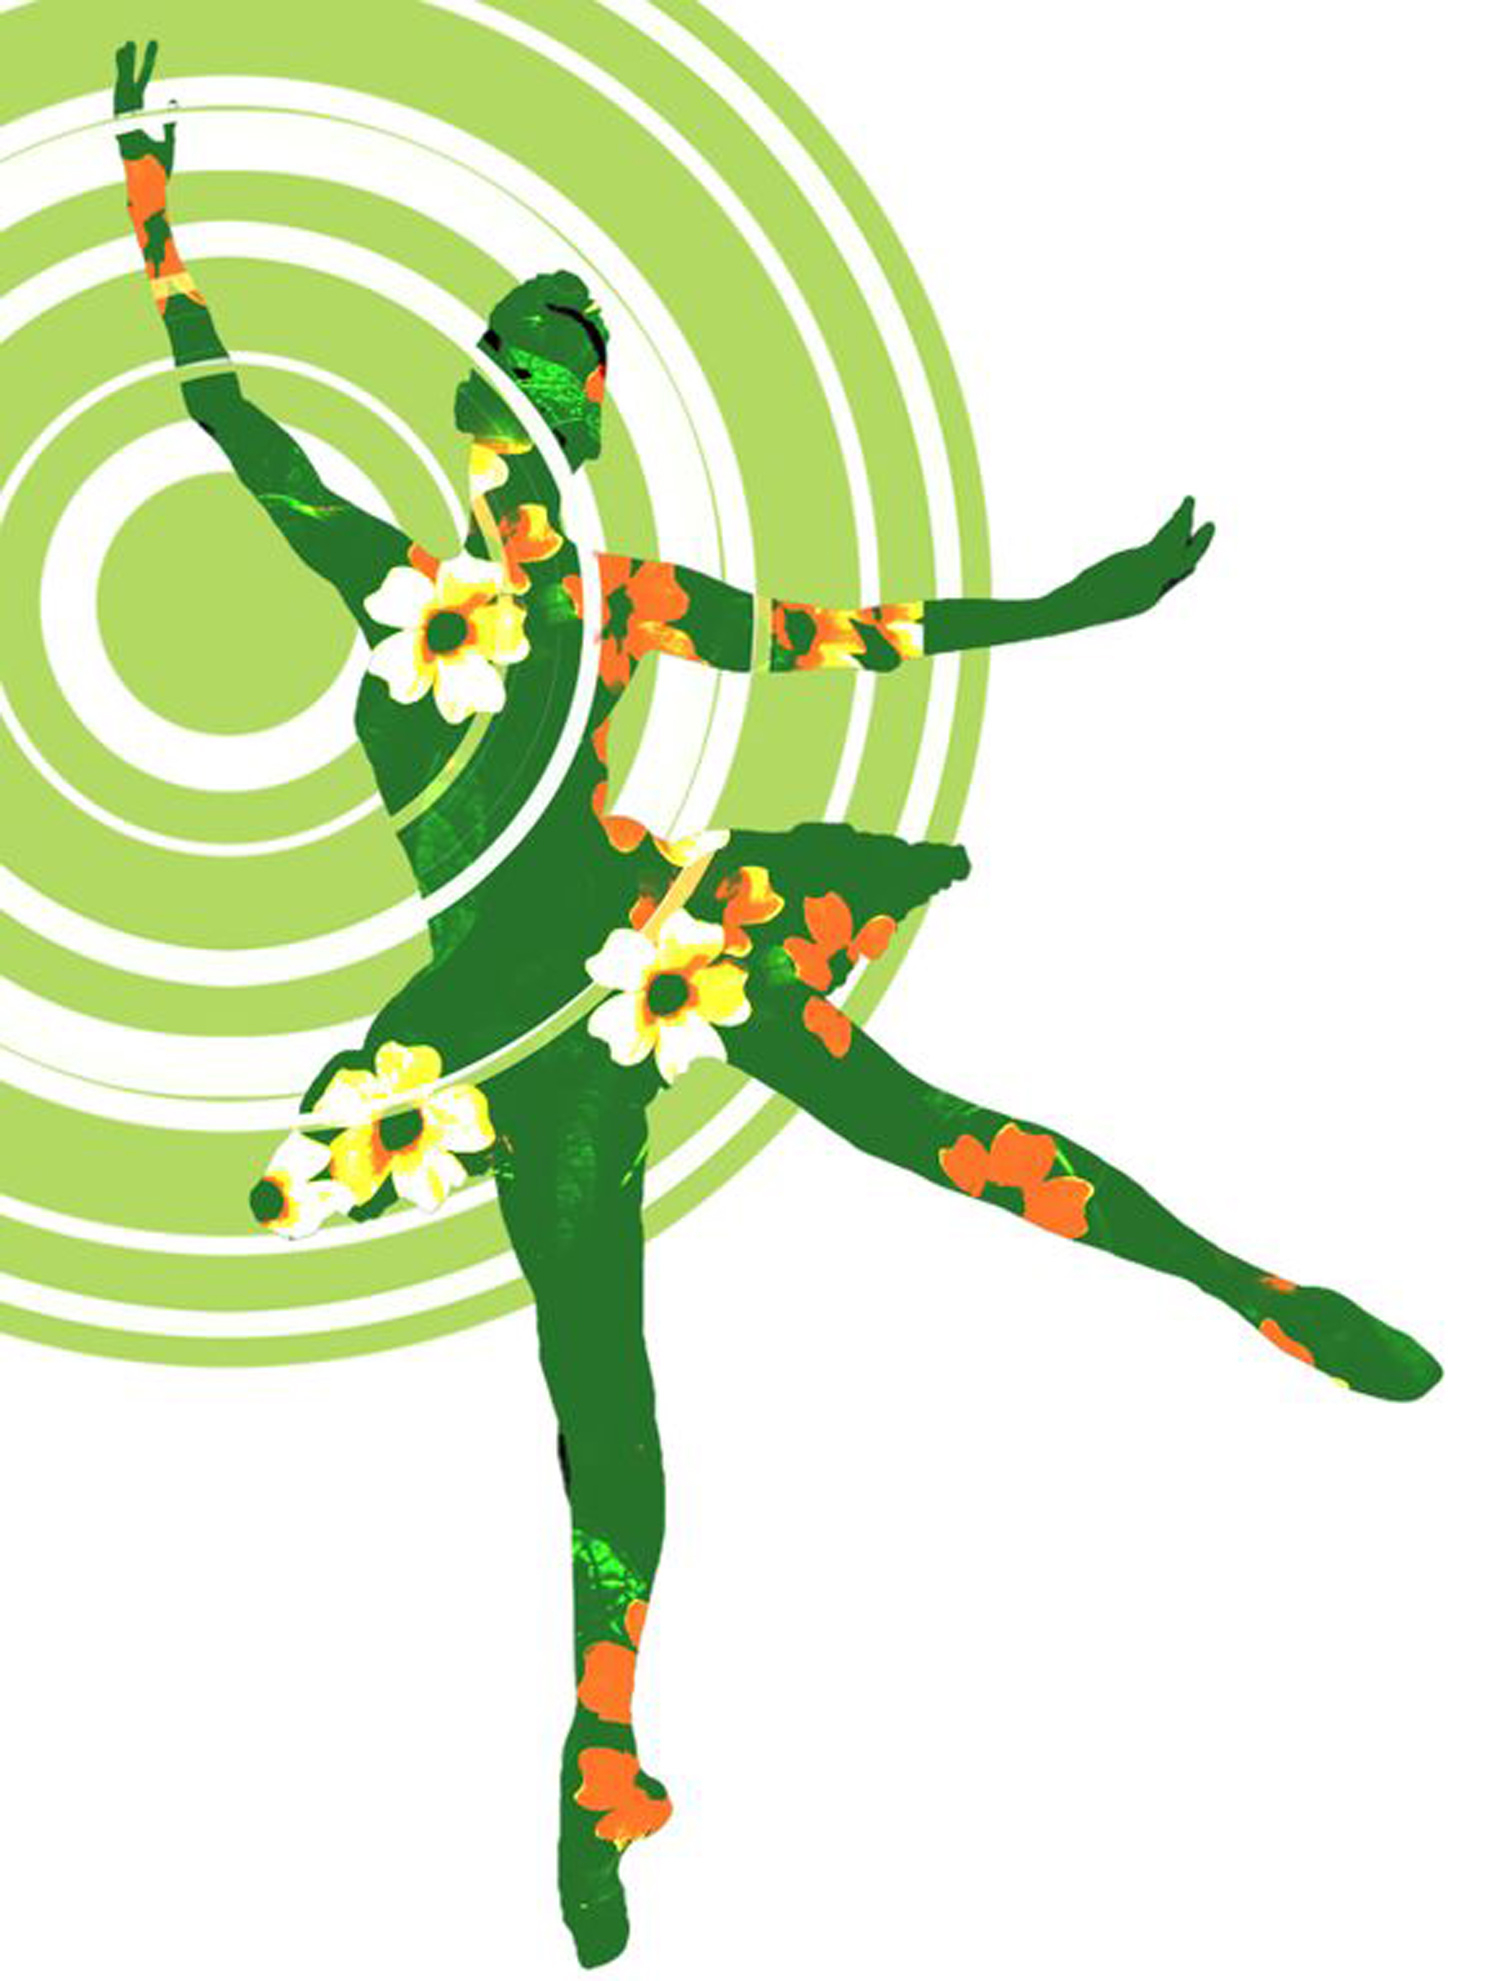 Ballet Dance Energy Choreography